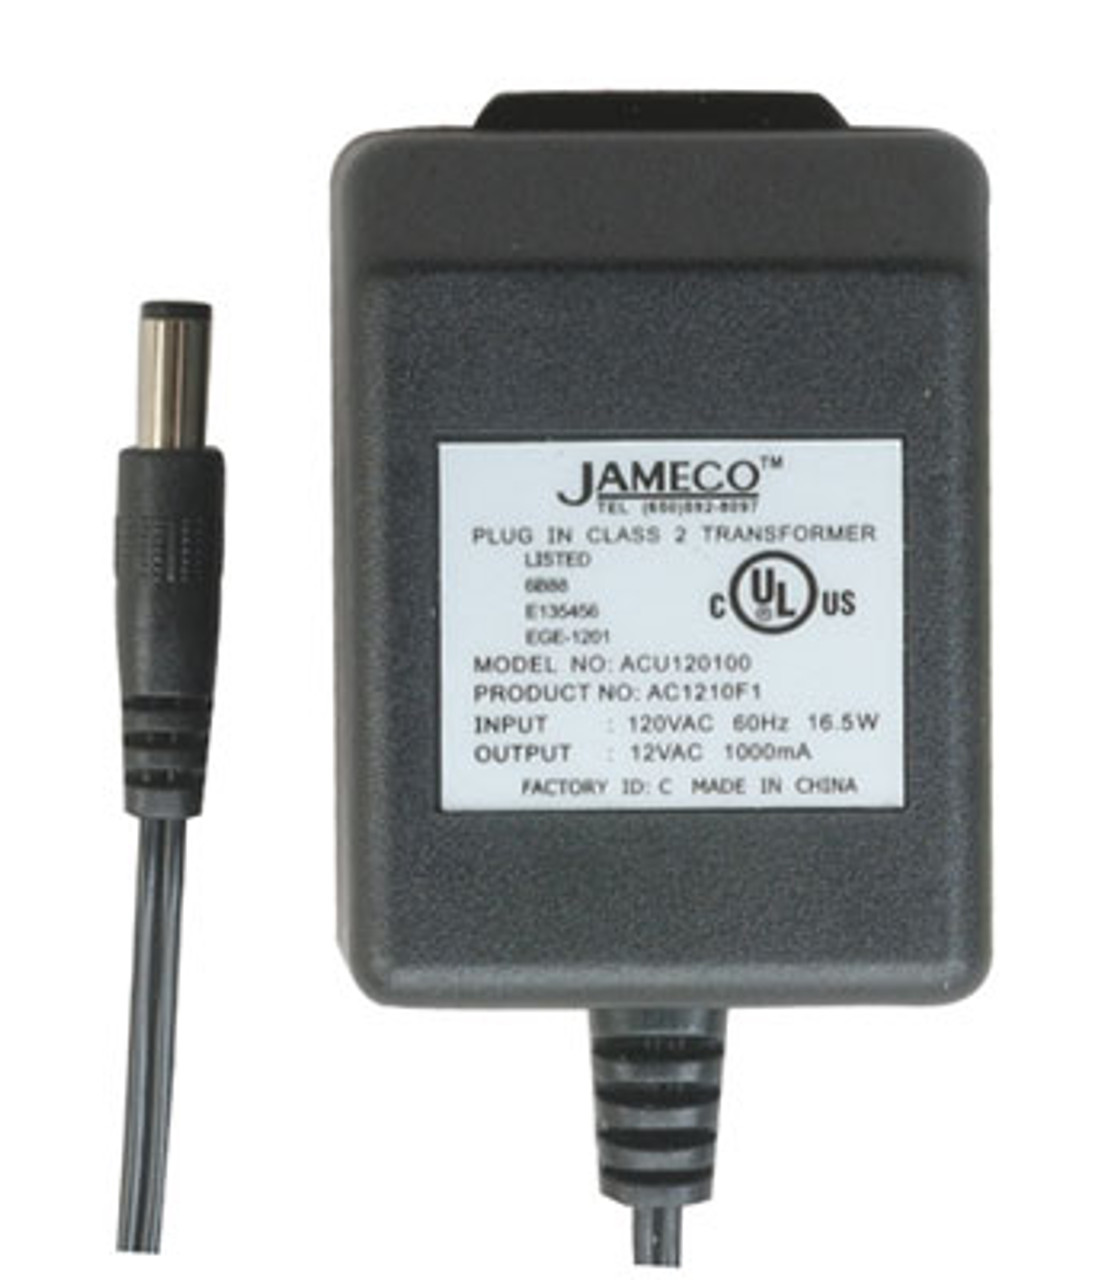 AC to AC Wall Adapter/Transformer, 12V 1000mA, Straight 2 1mm Female Plug